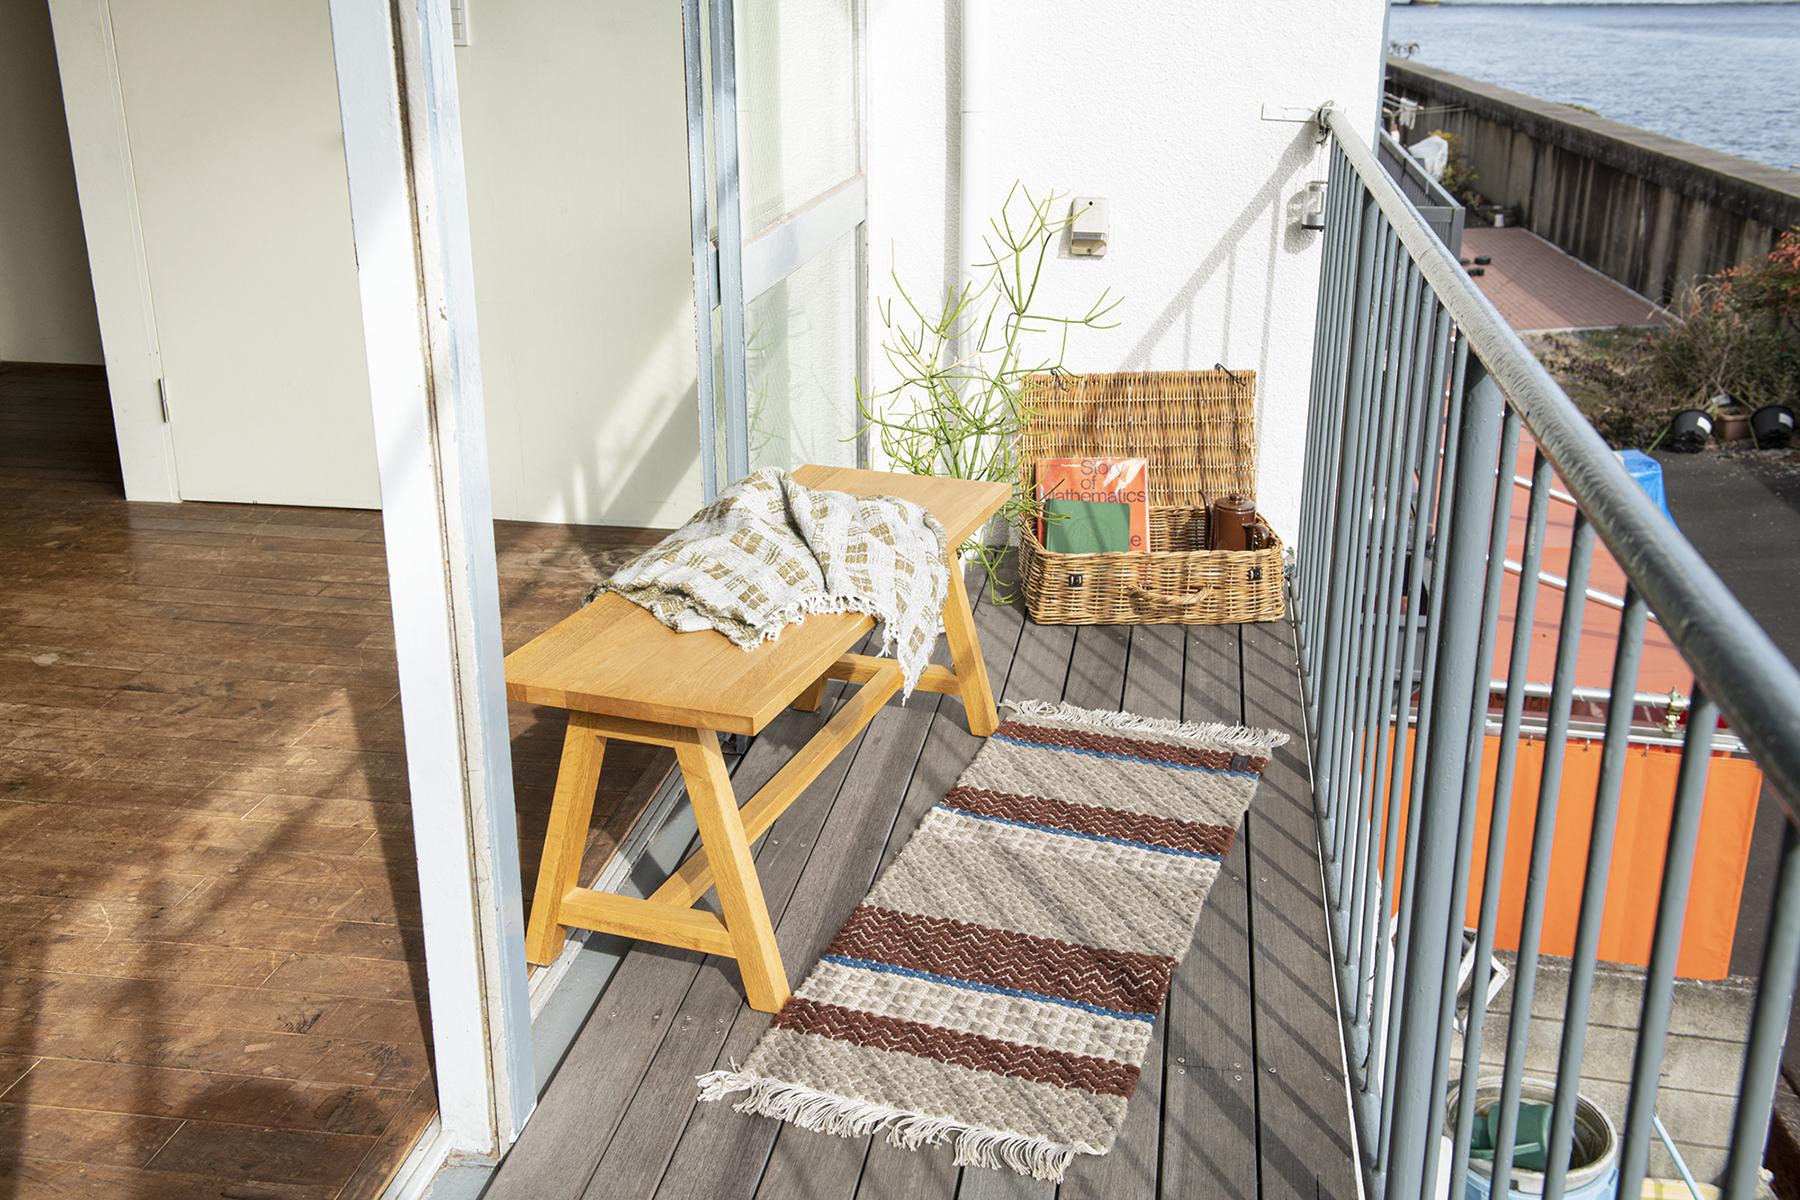 cobaco kitchen(コバコ キッチン)隅田川の眺め